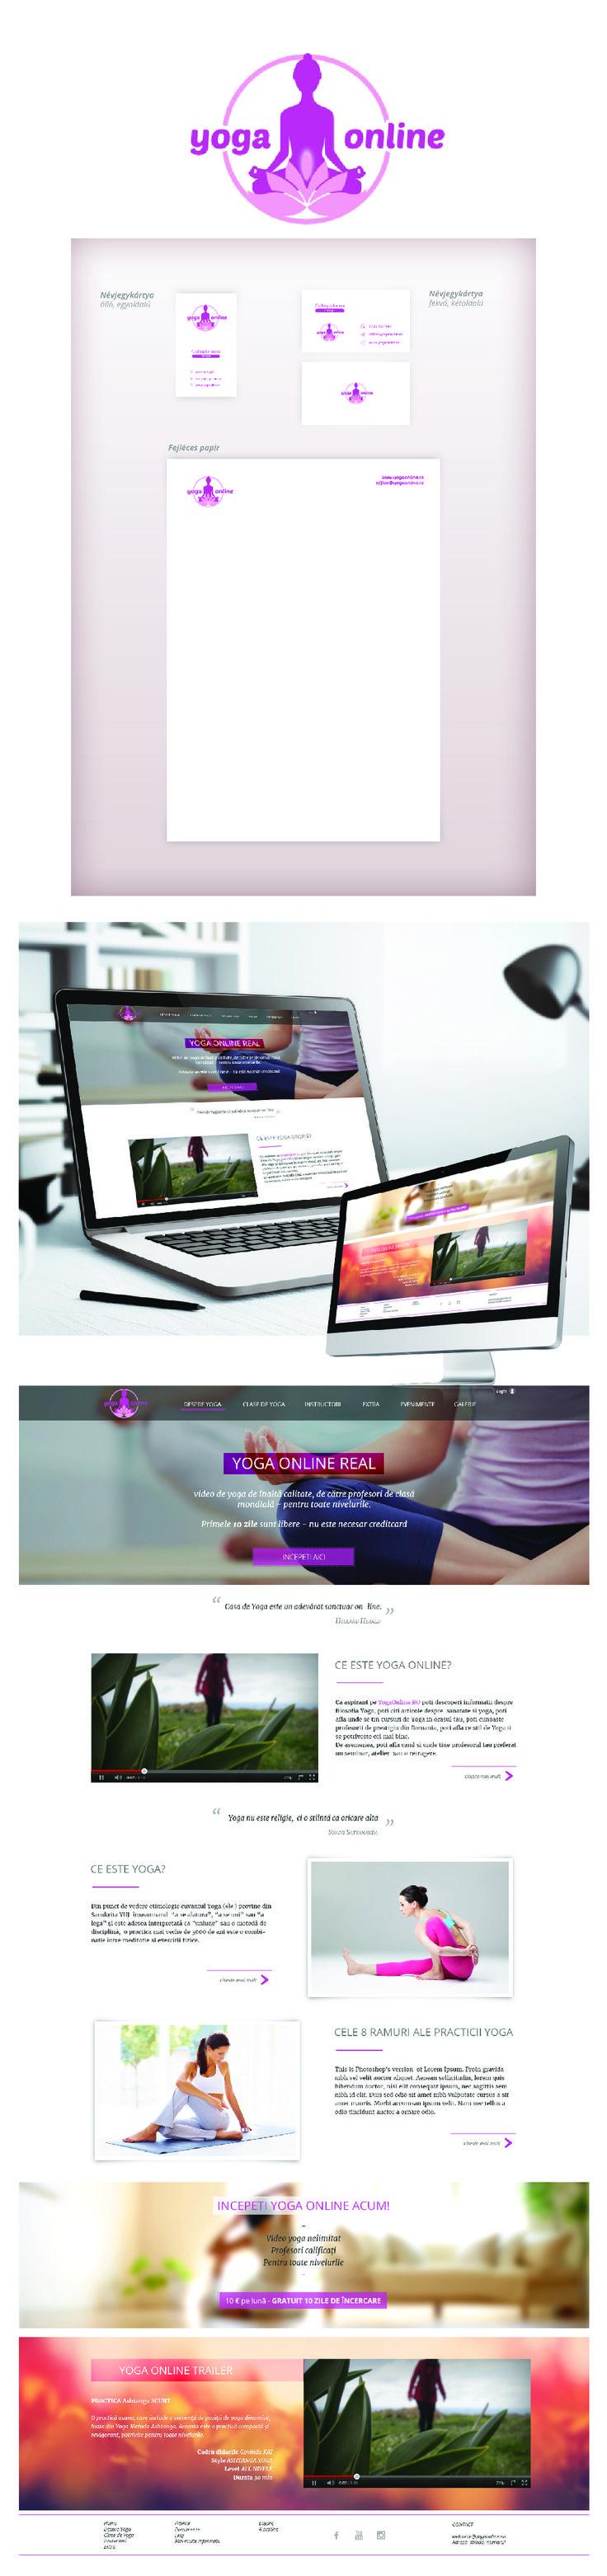 Logo - Business card - Header - Website design - Yoga Online, Romania #1 online yoga community